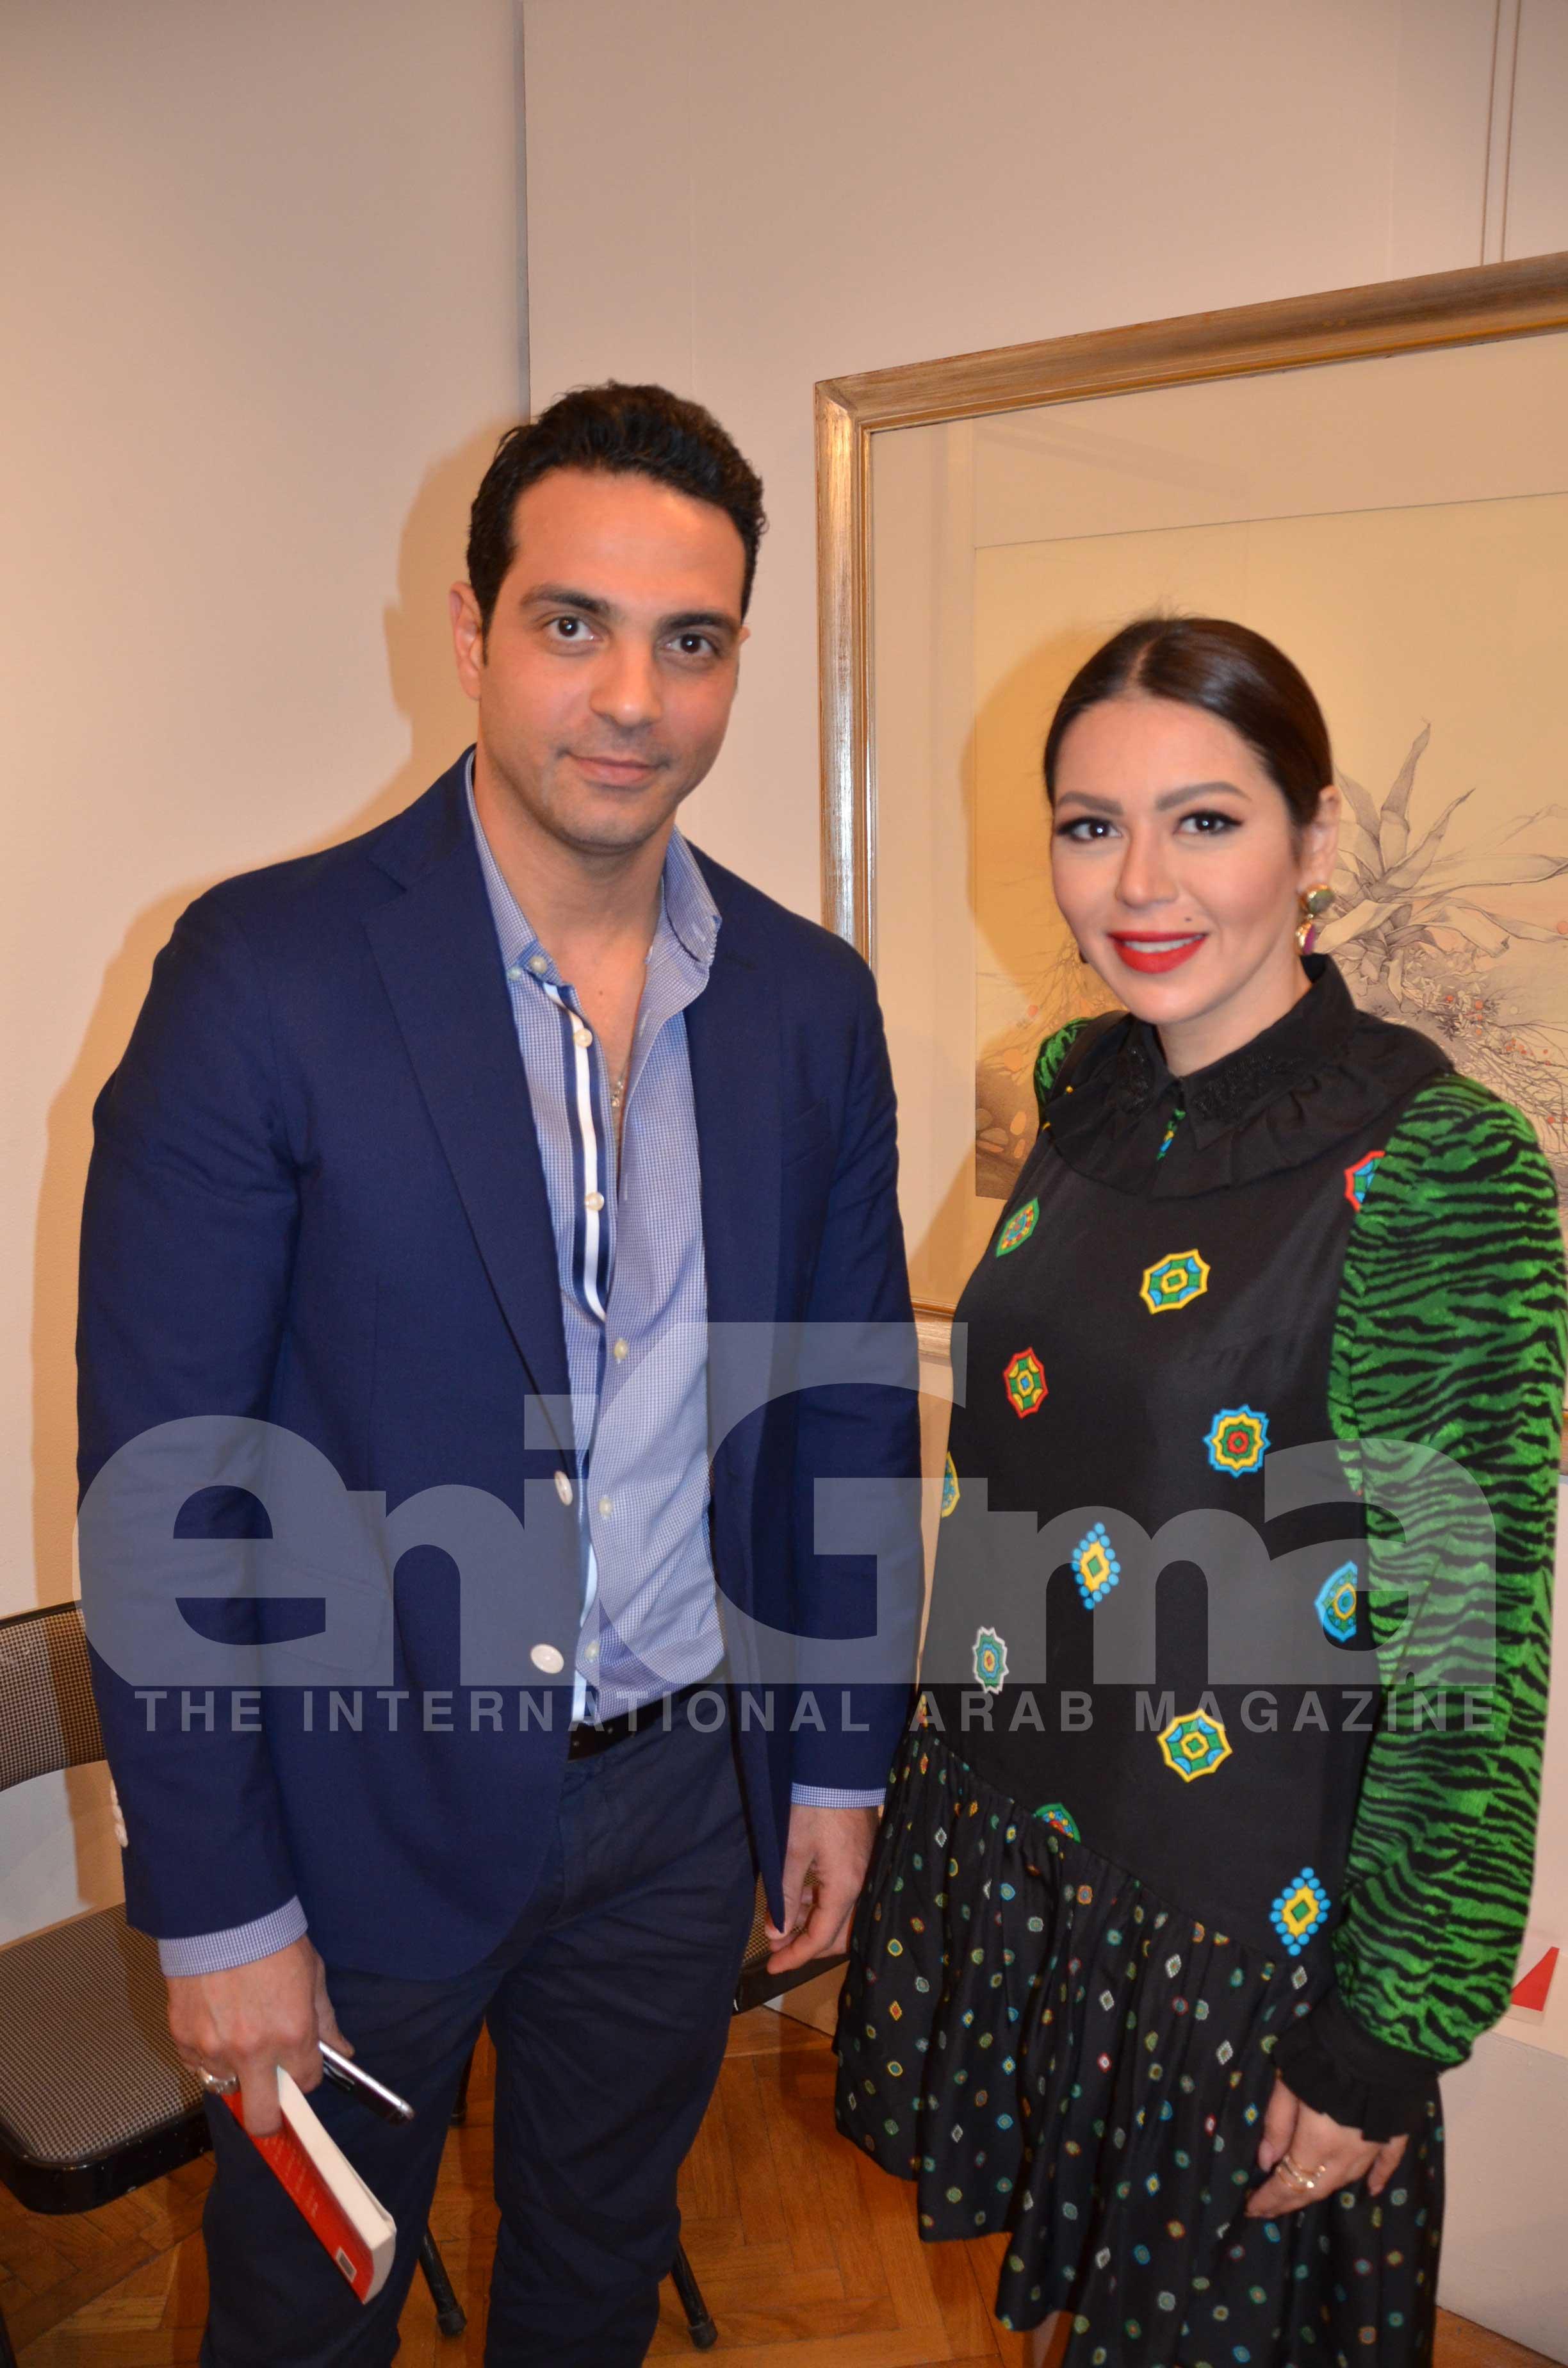 Mr. Hany Abou Taleb & Lekaa Elkhamissi